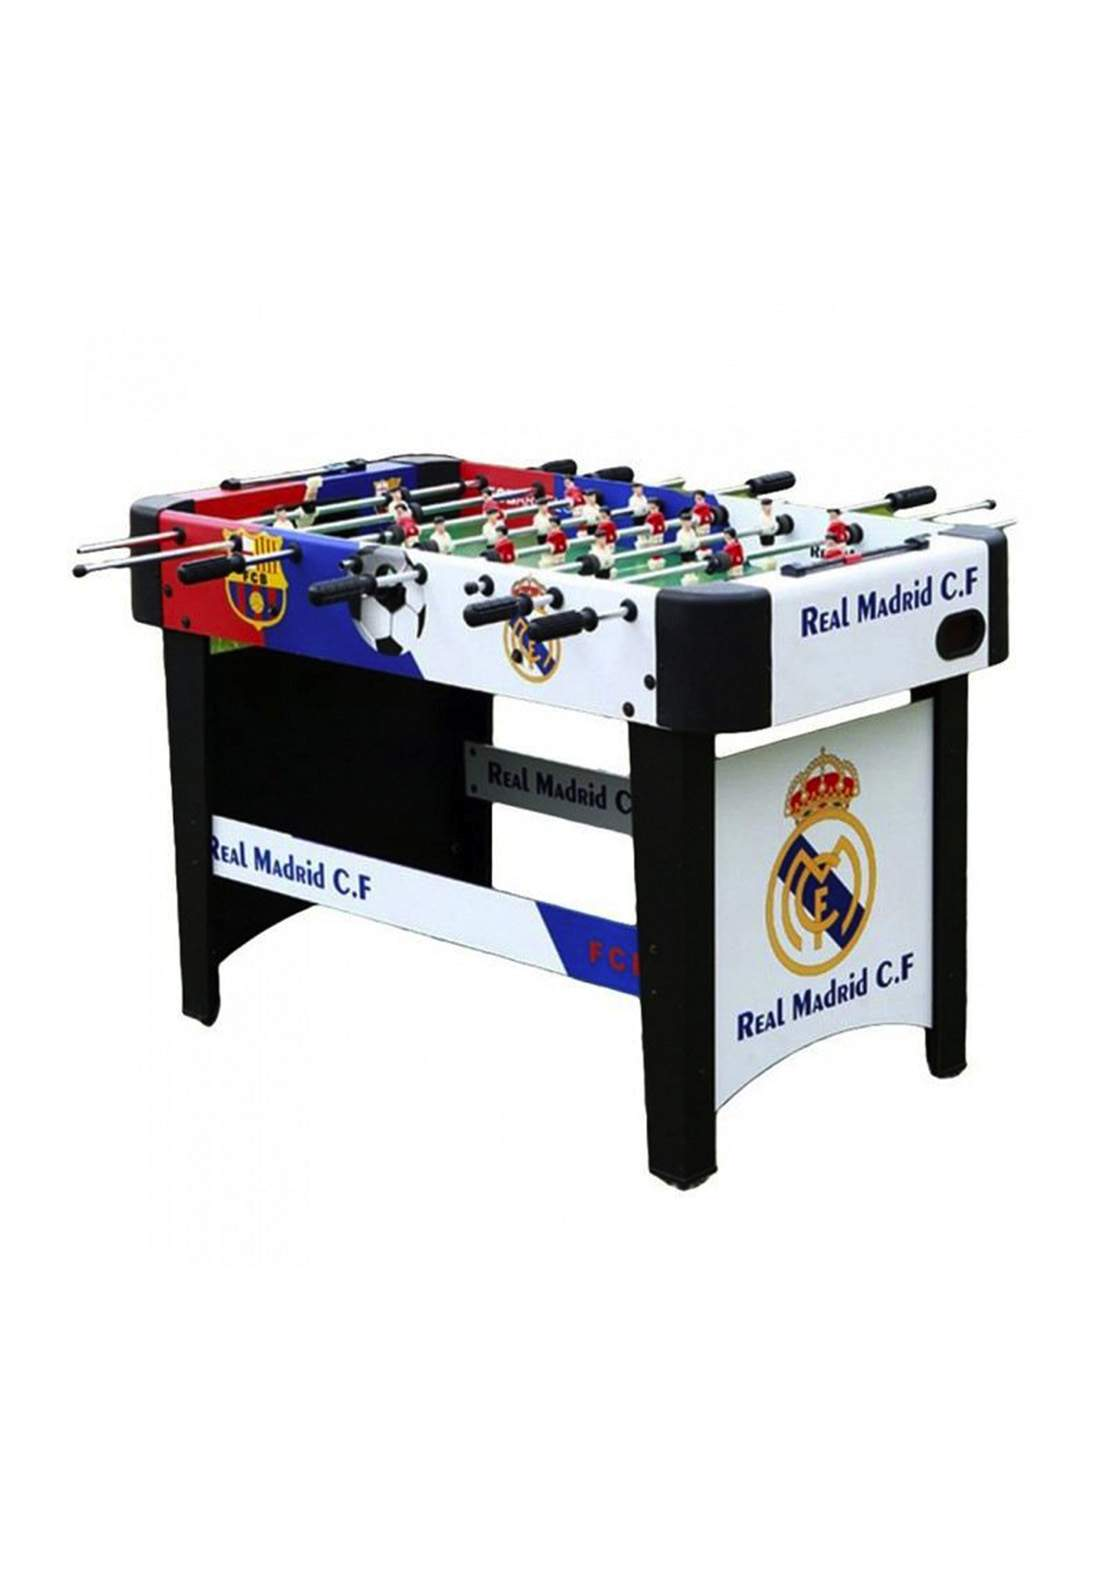 Foosball Recreational Soccer Table Board Games فيشة